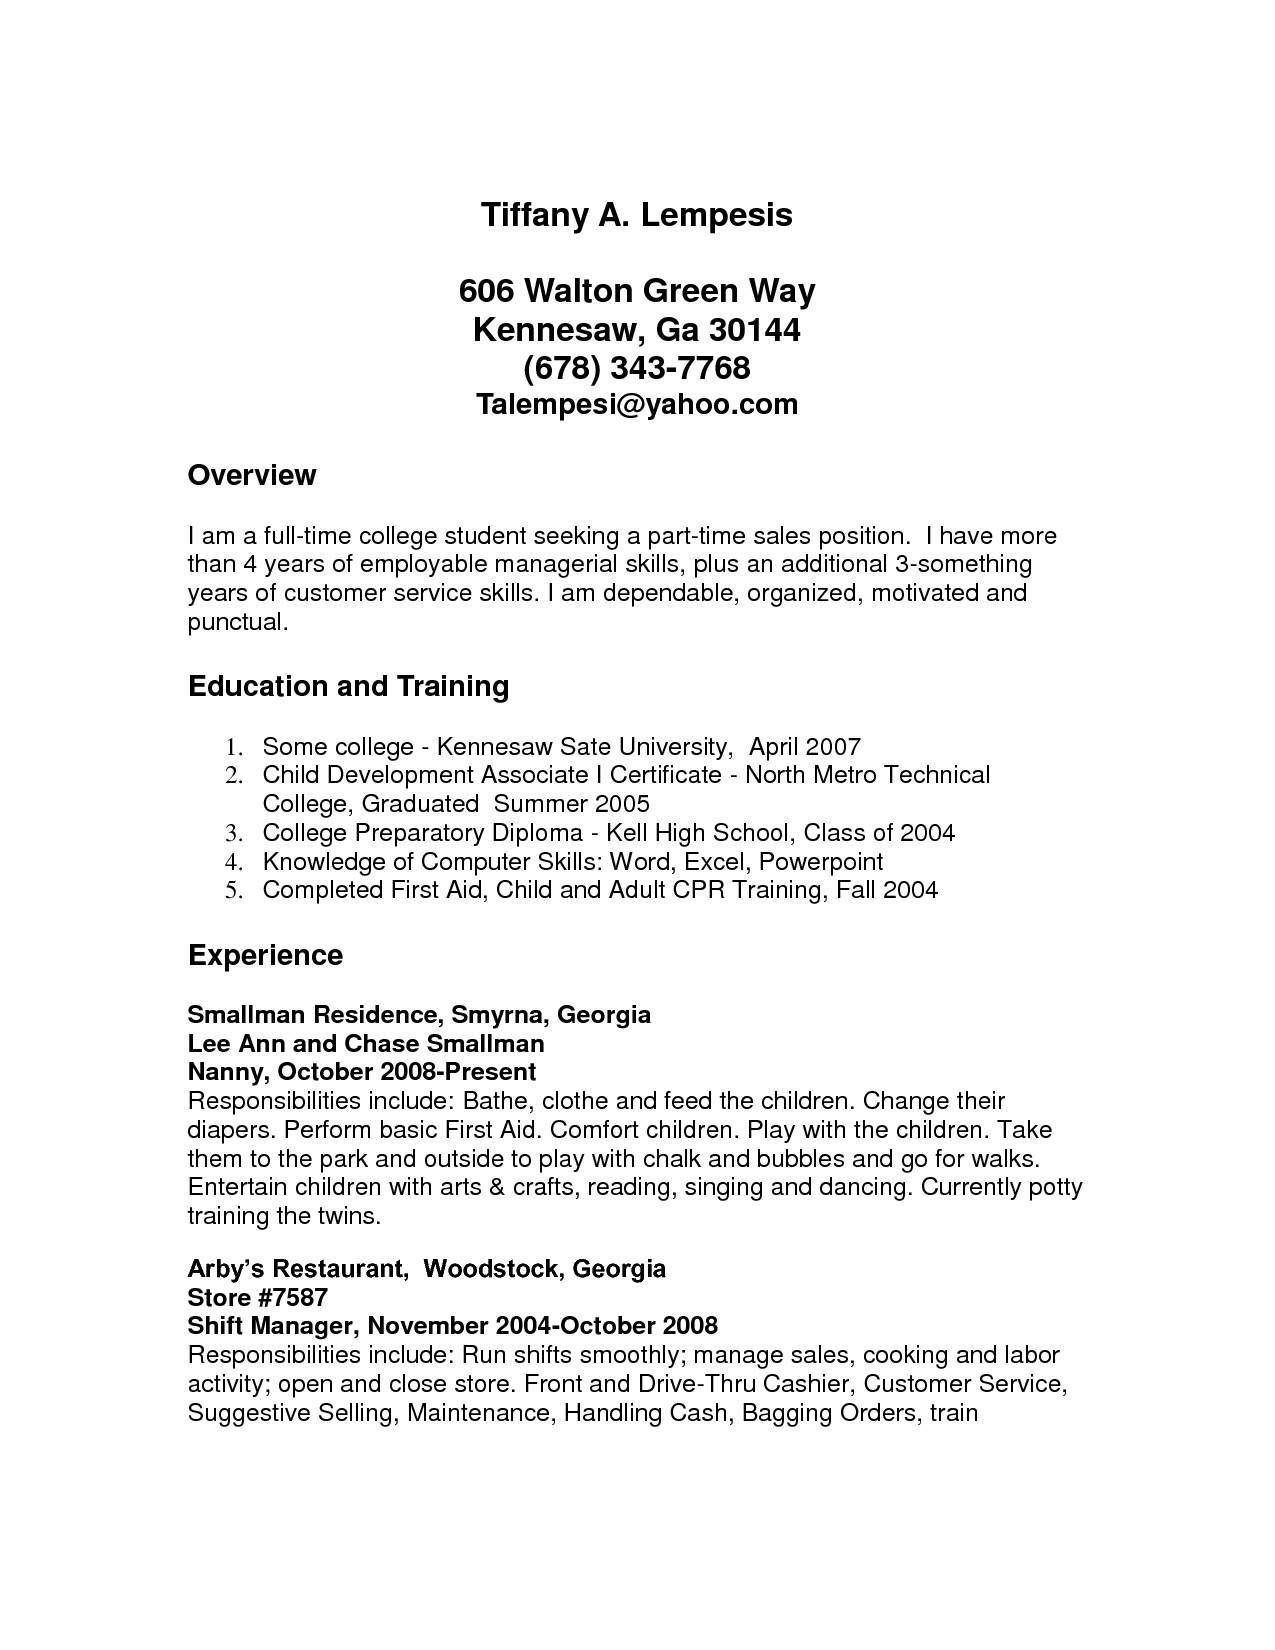 Sample Resume Xls Format Format Resume Sample Cover Letter For Resume Job Resume Samples Job Resume